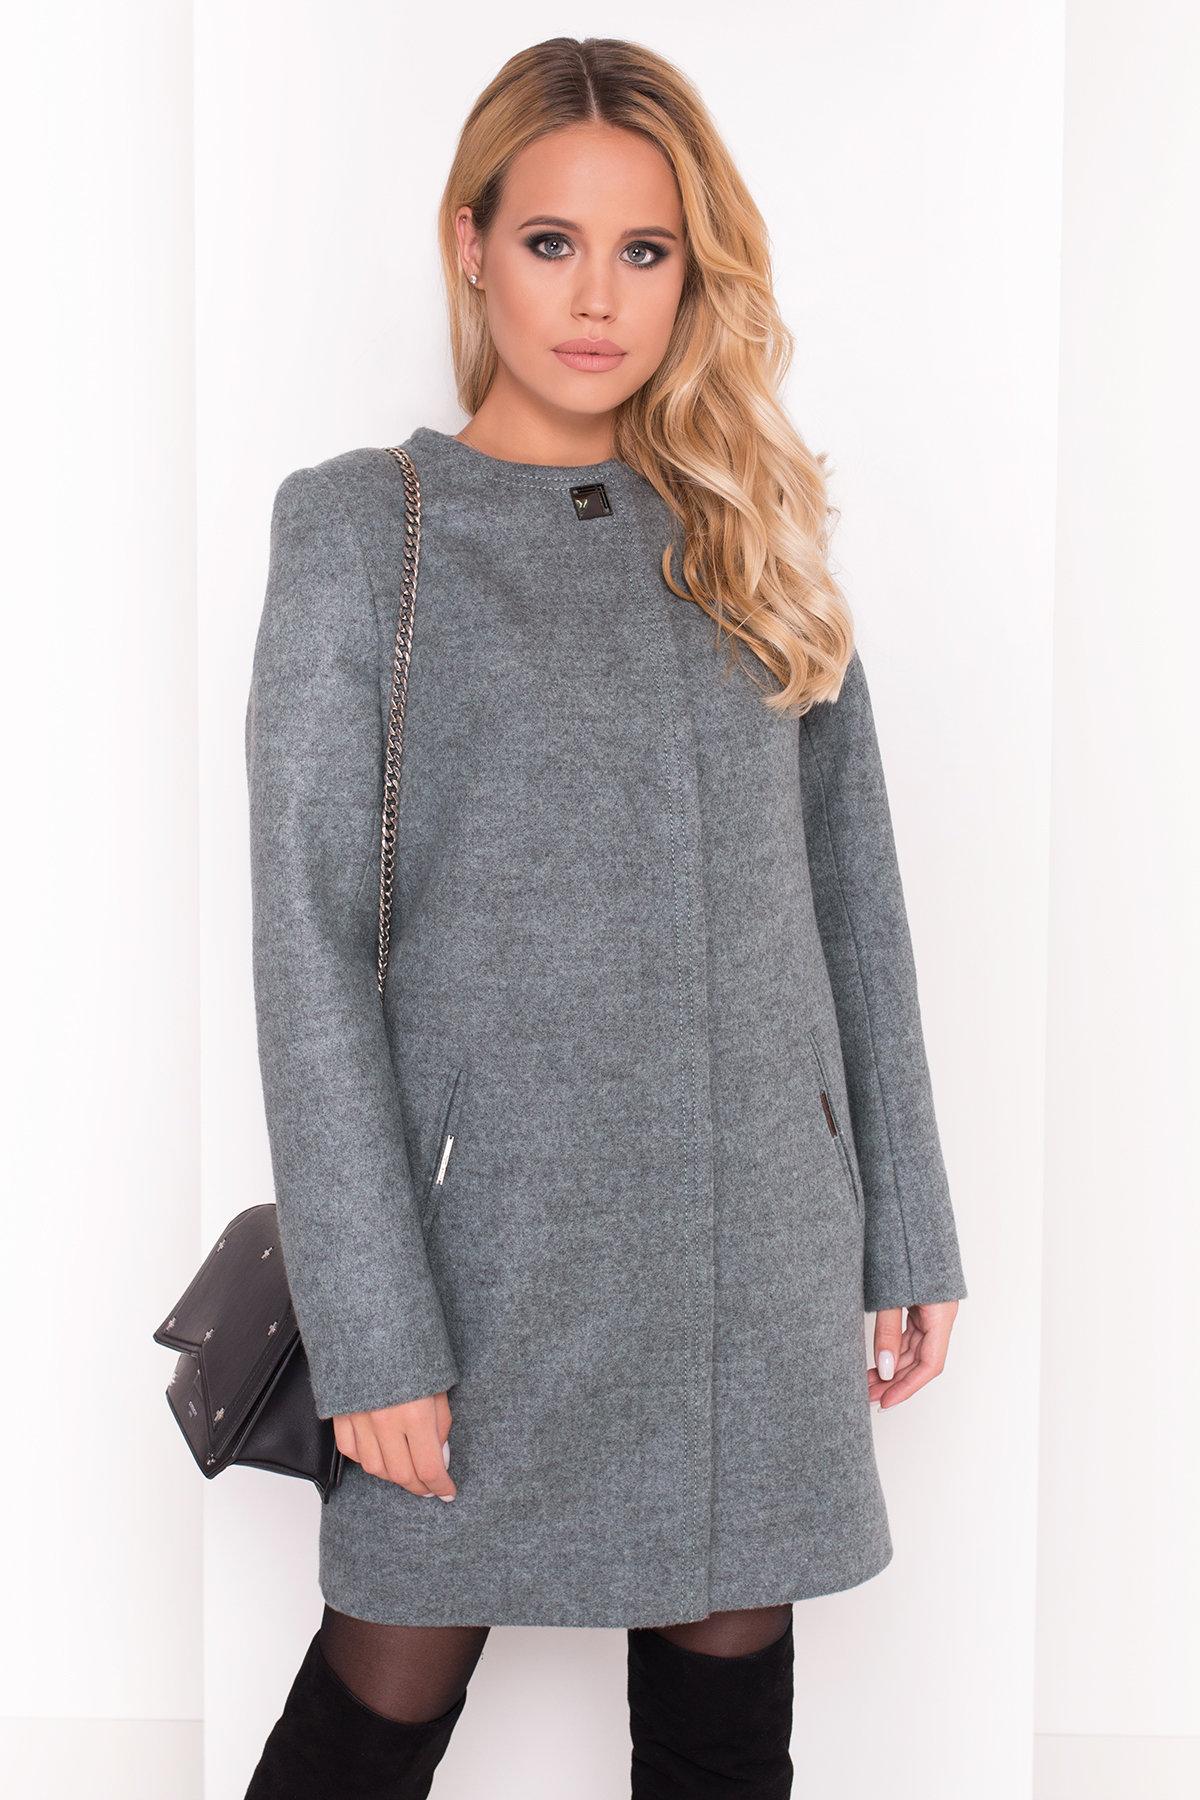 Демисезонное пальто Ферран 5369 АРТ. 37437 Цвет: Олива - фото 4, интернет магазин tm-modus.ru